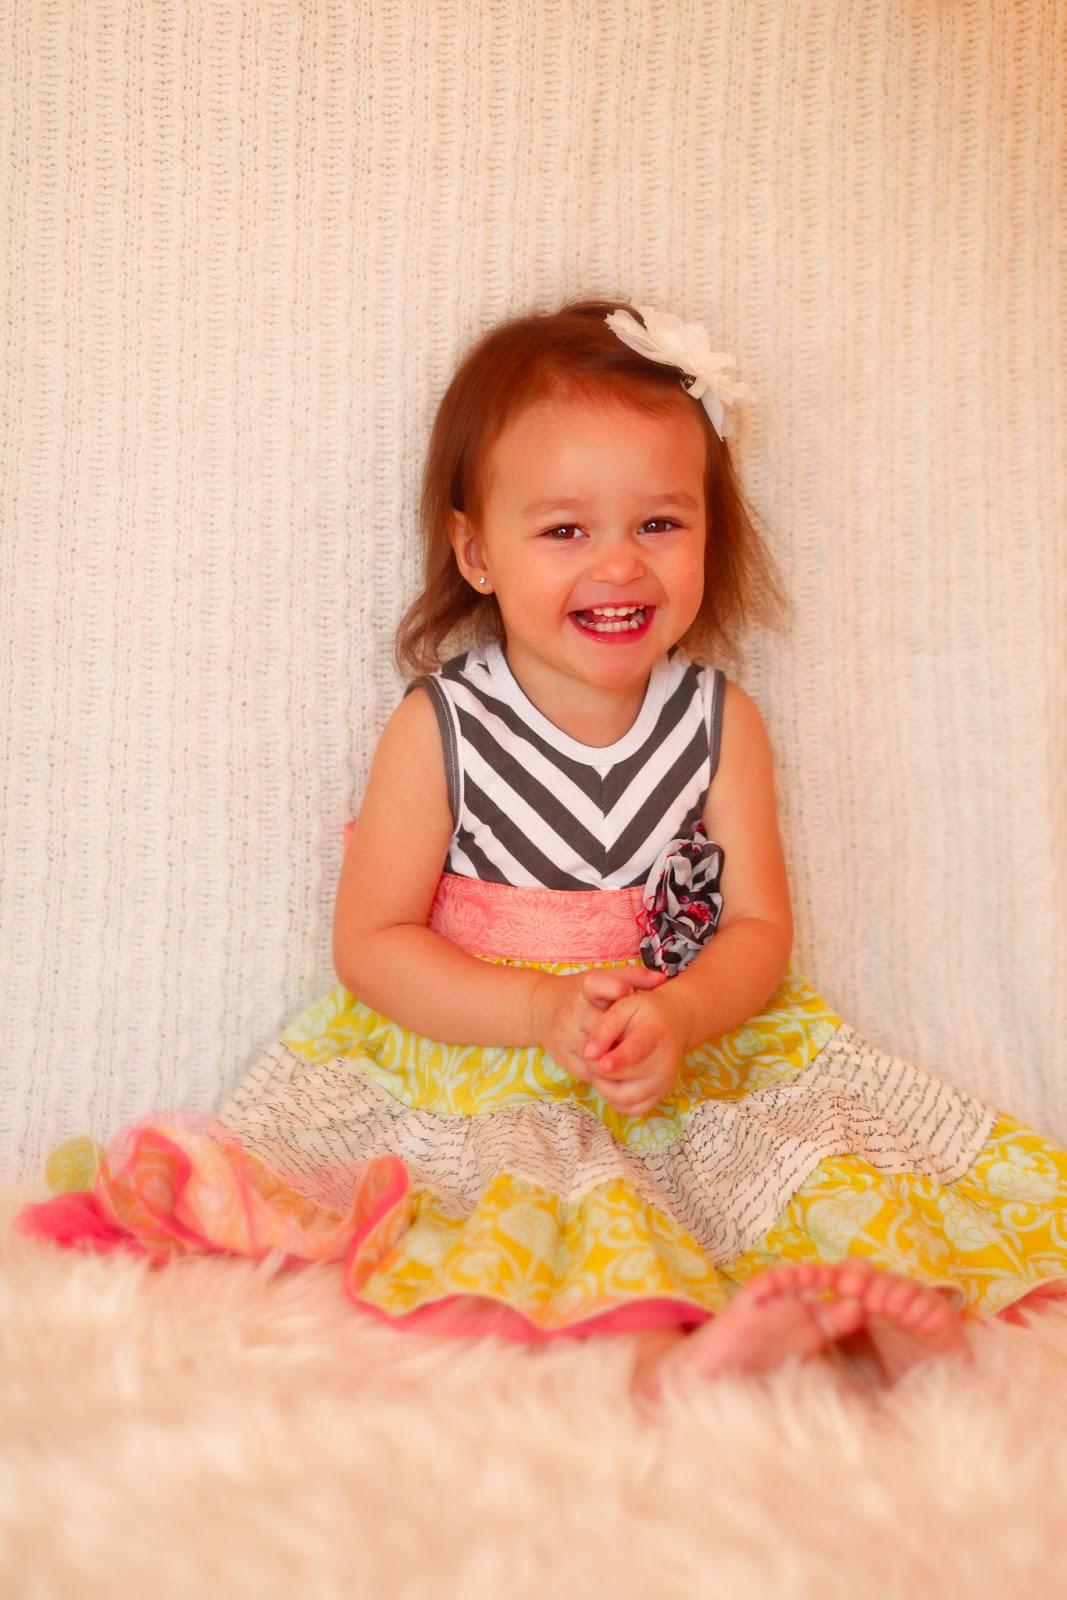 Baby Jewel Nude Photos 30